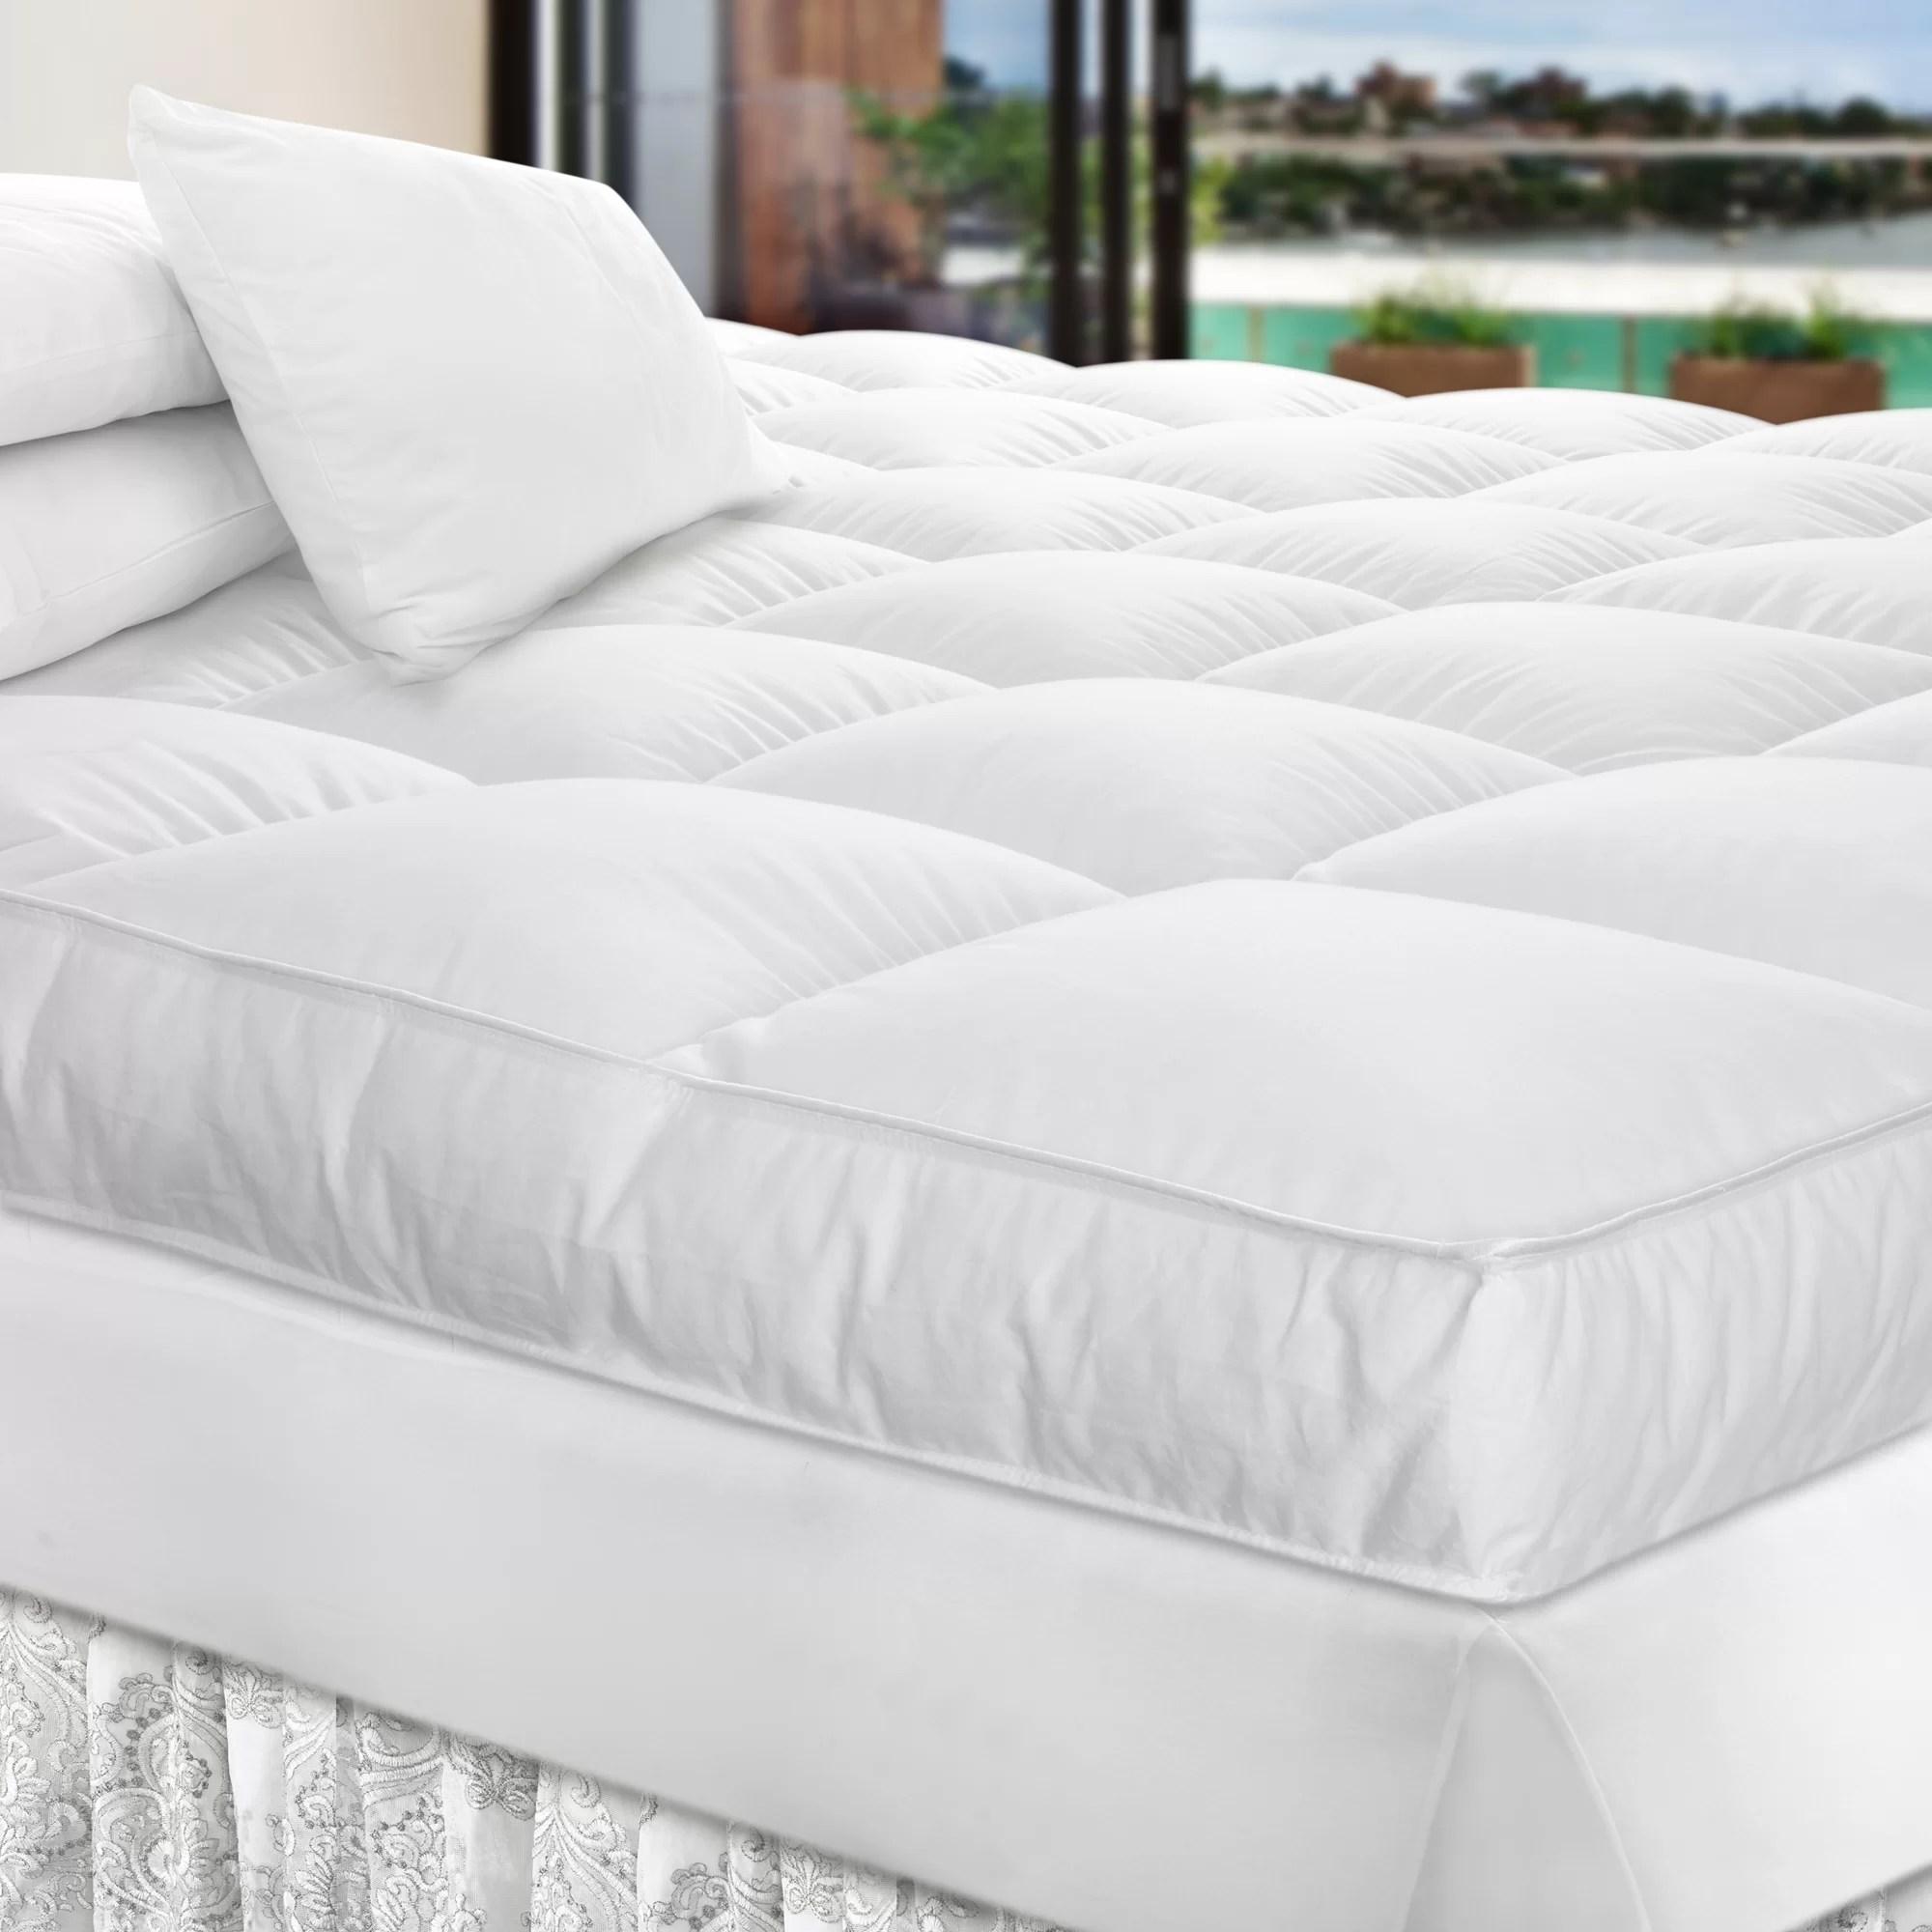 goose down mattress topper